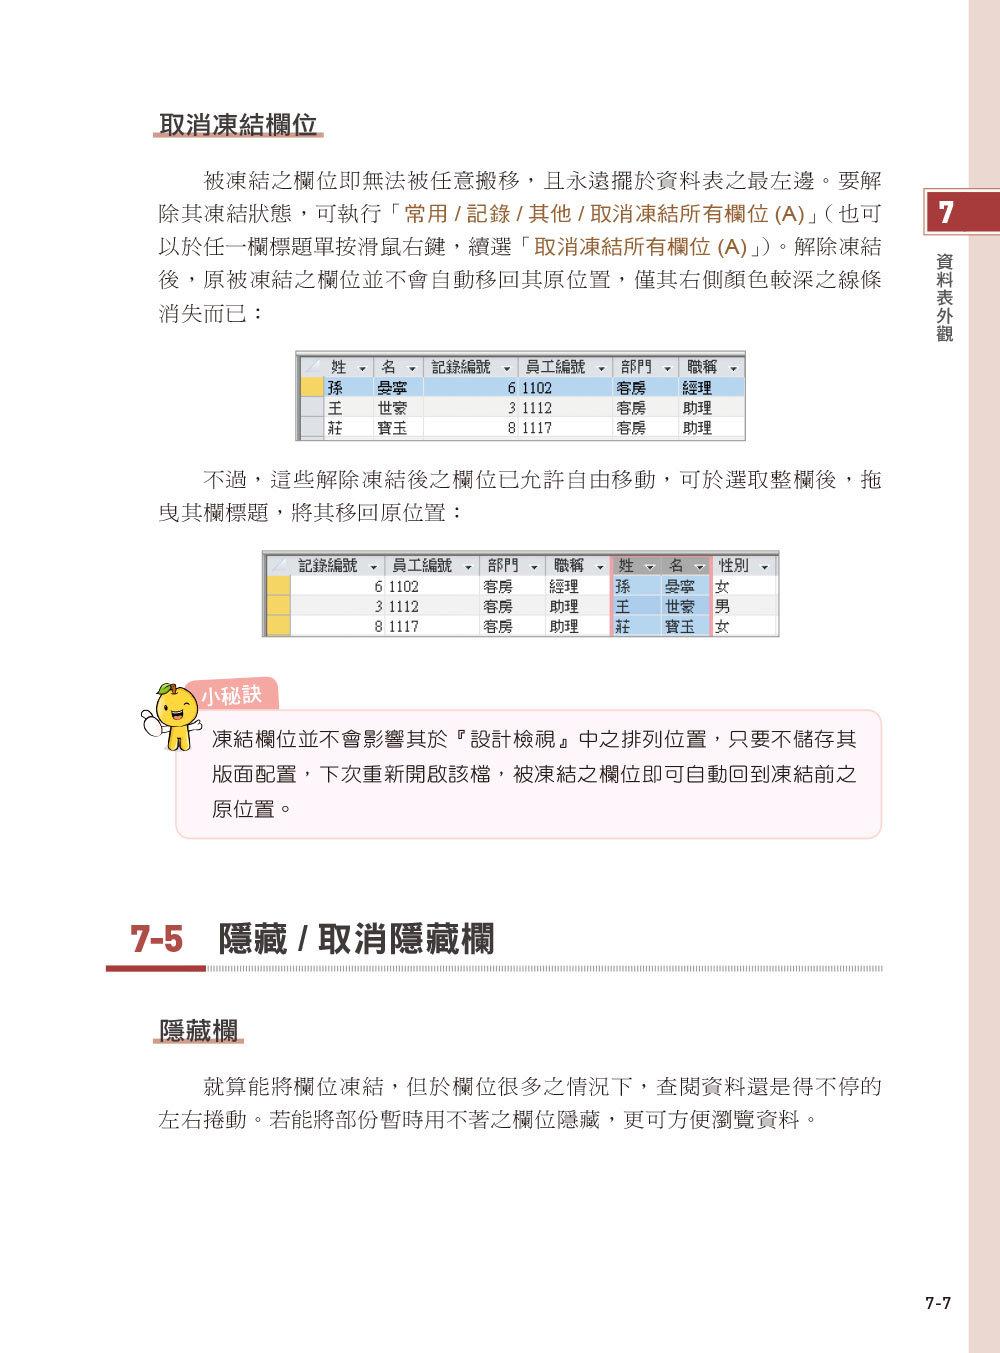 Access 2019 嚴選教材!資料庫建立.管理.應用-preview-7